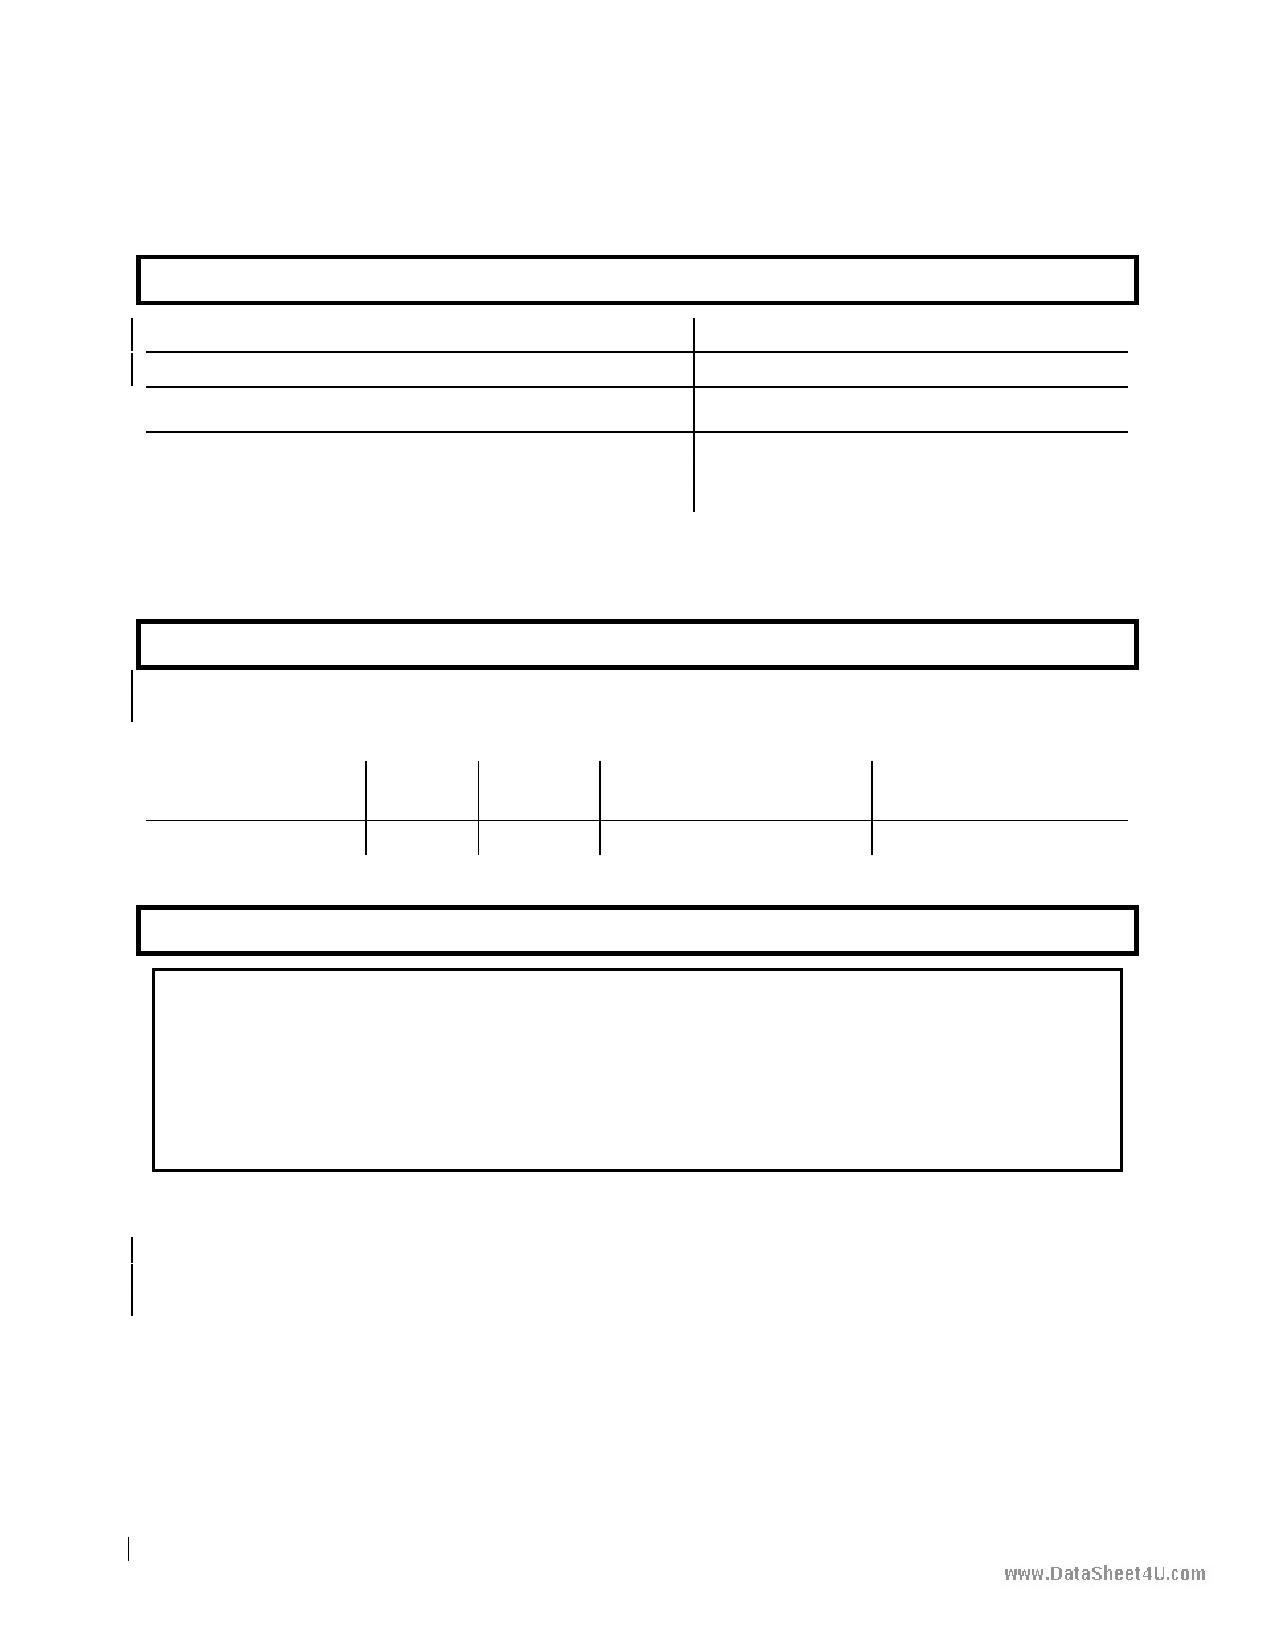 P-4602-F دیتاشیت PDF